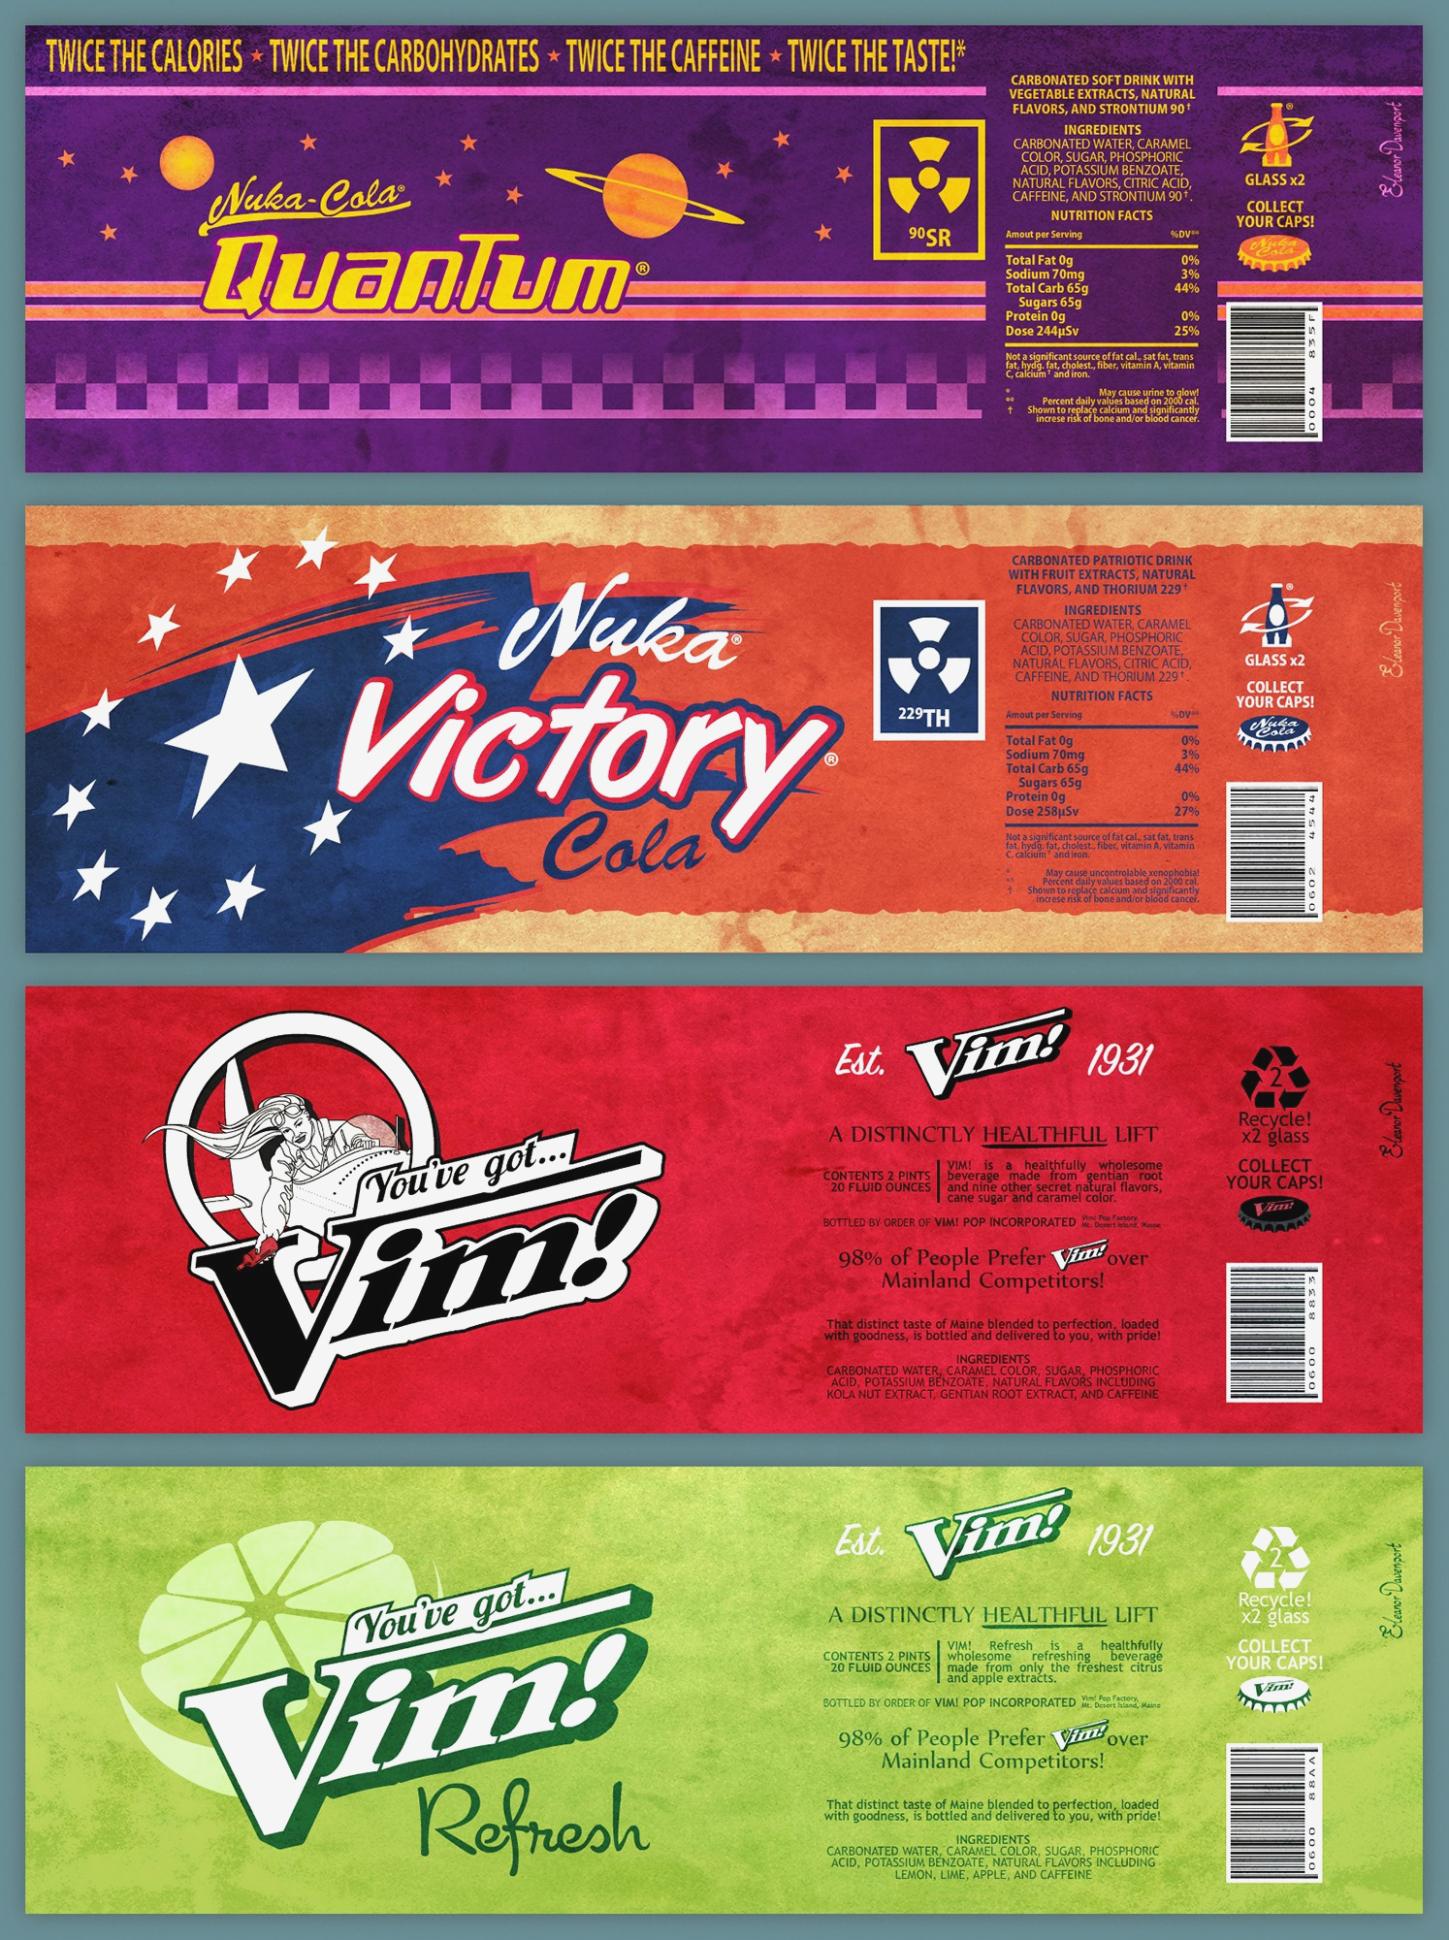 Free Printable Vending Machine Labels (67+ Images In Collection) Page 1 - Free Printable Soda Vending Machine Labels